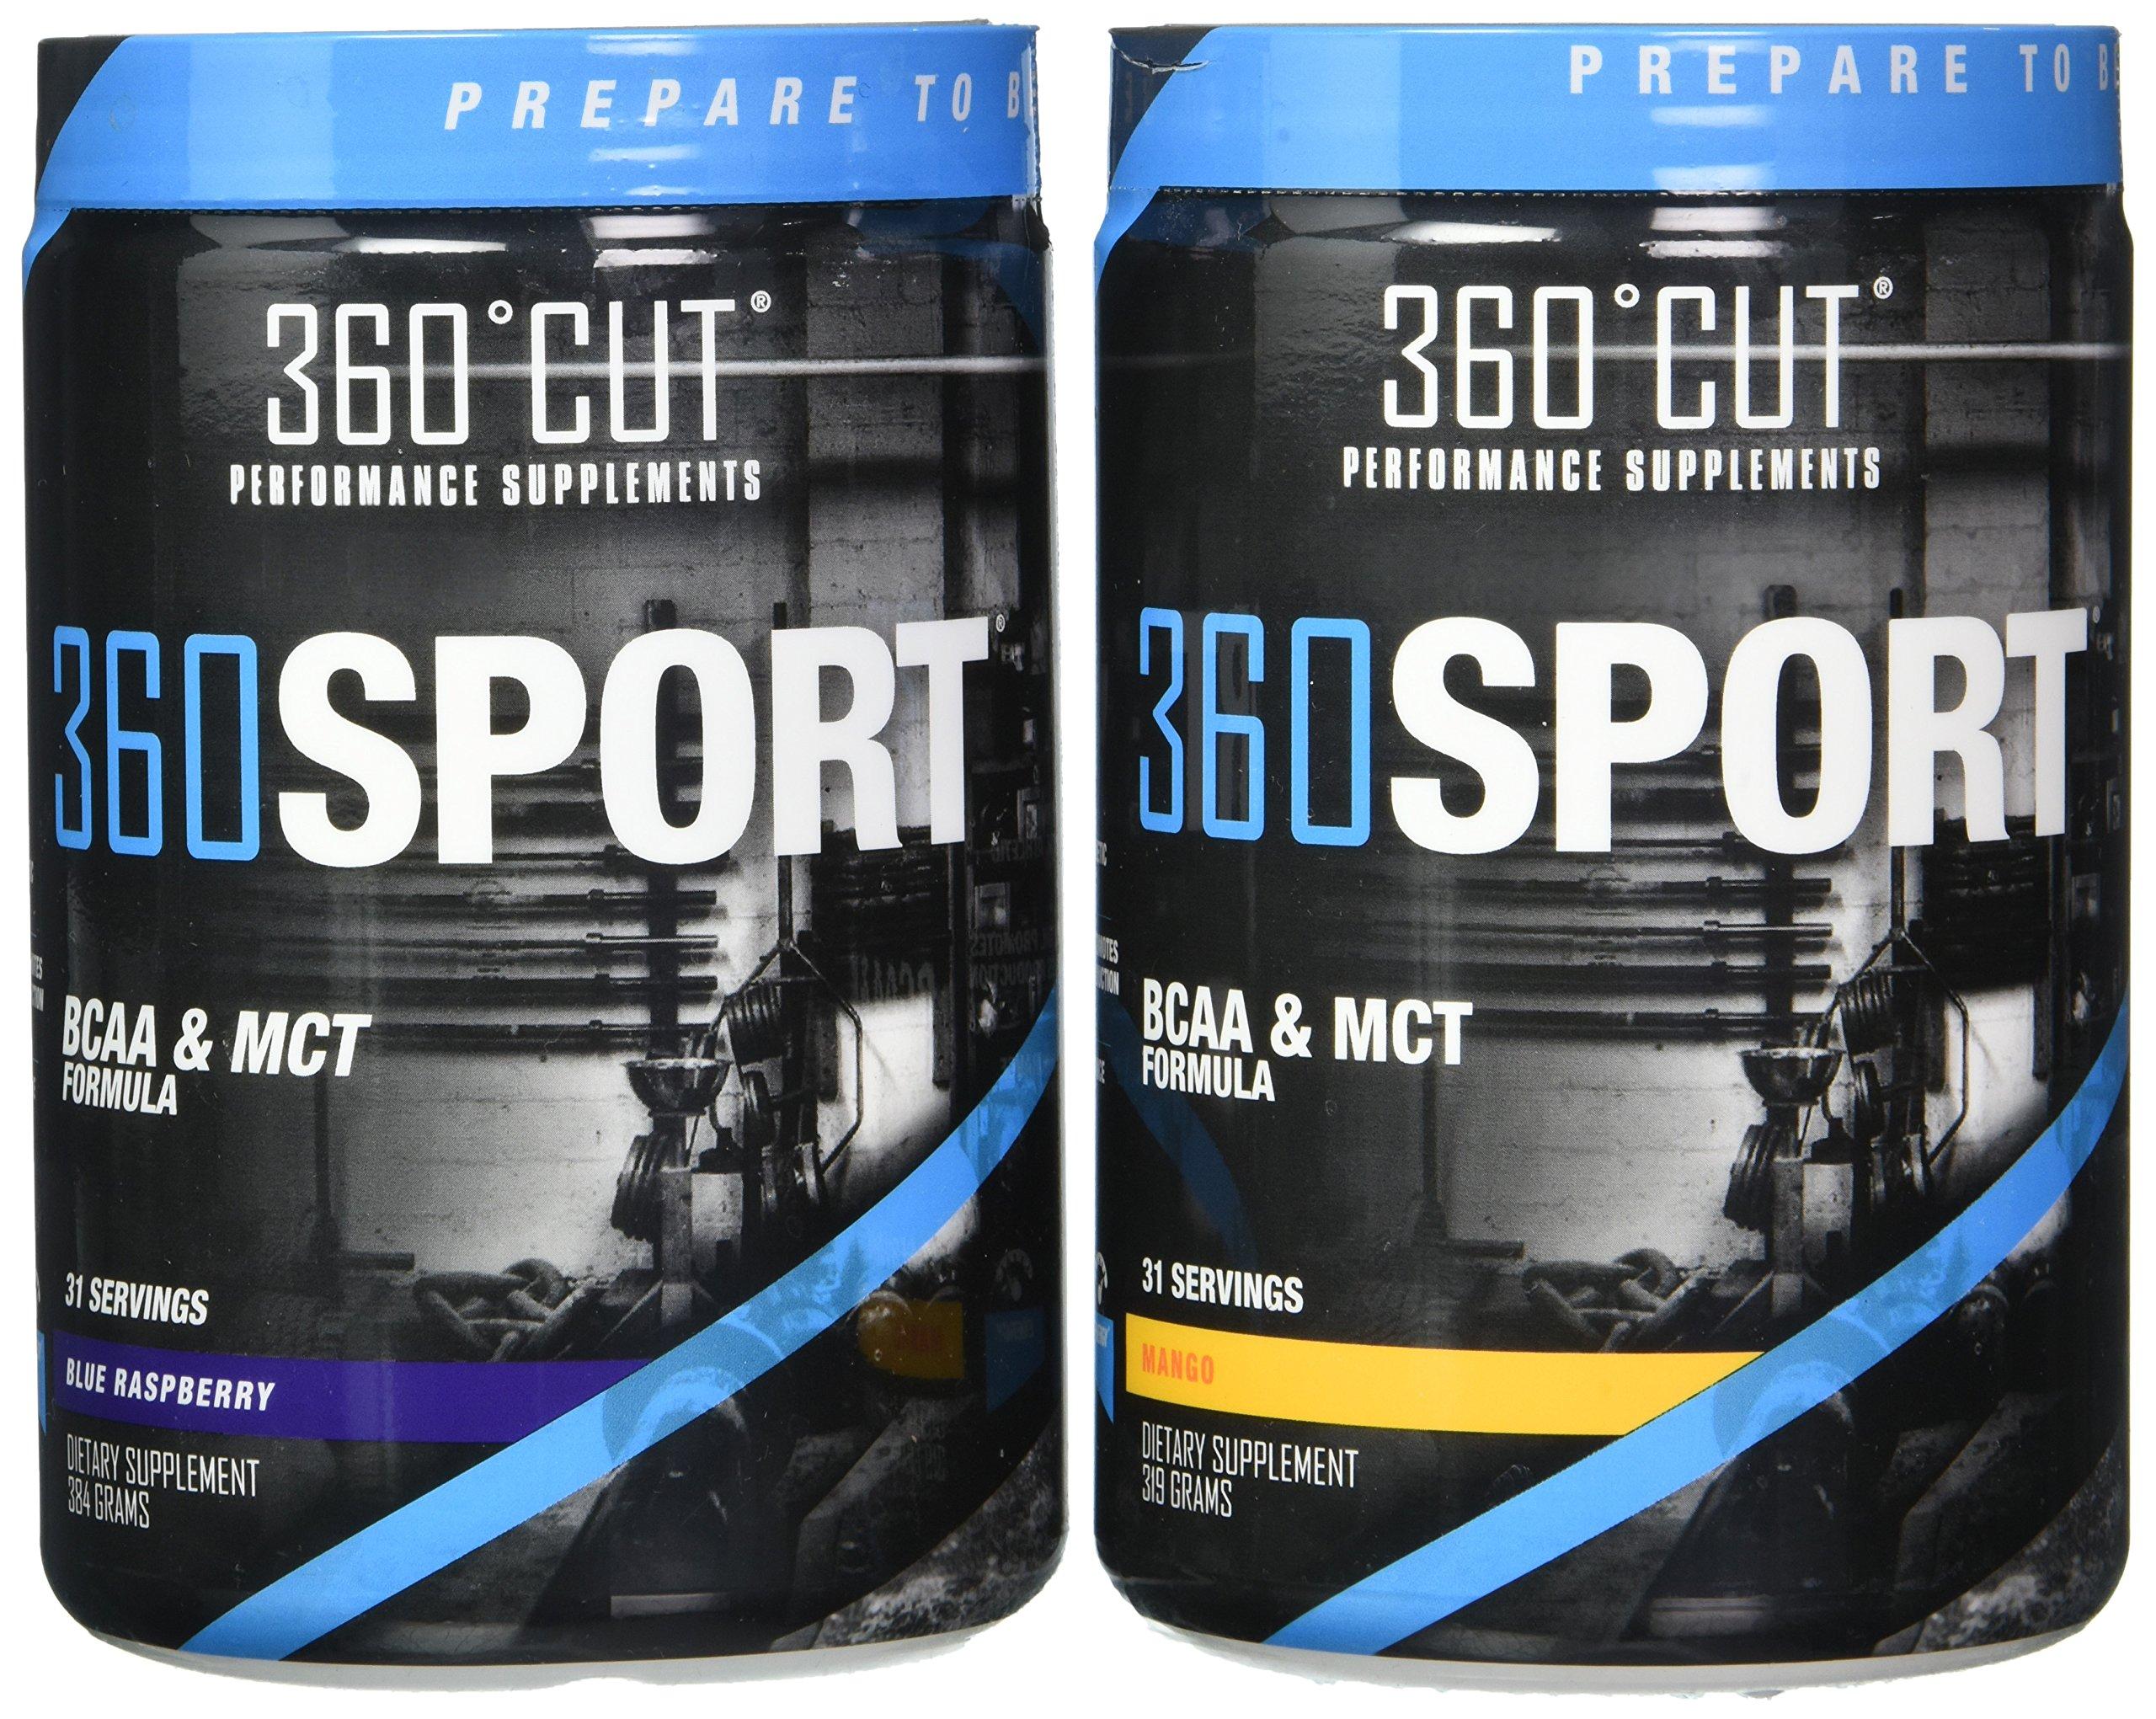 360Cut 360Sport Instantized BCAA and All Natural MCT Oil Formula, Blue Raspberry/Mango, 768 Gram